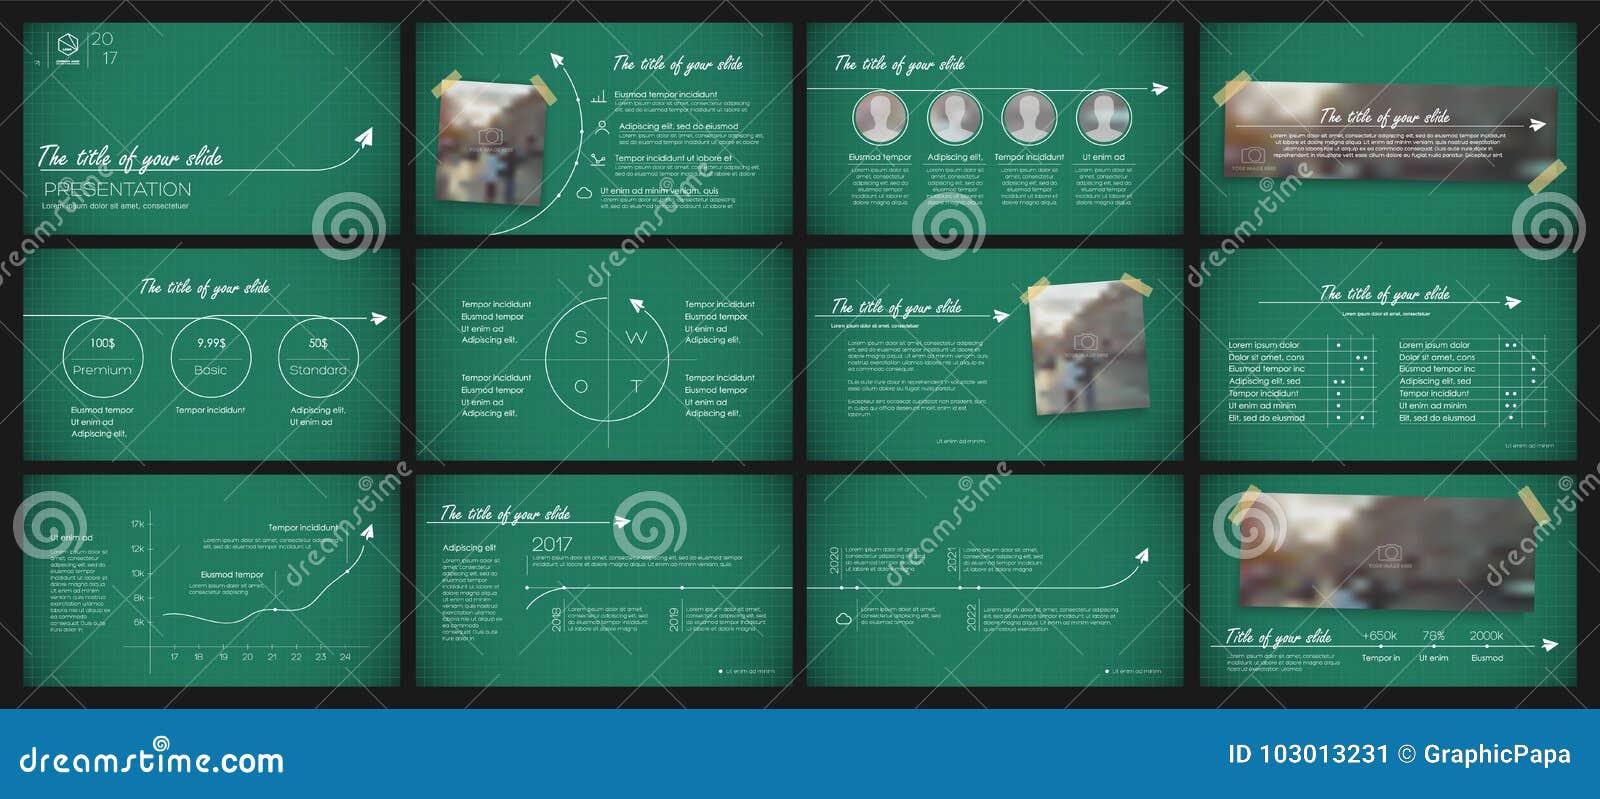 presentation templates elements stock vector illustration of